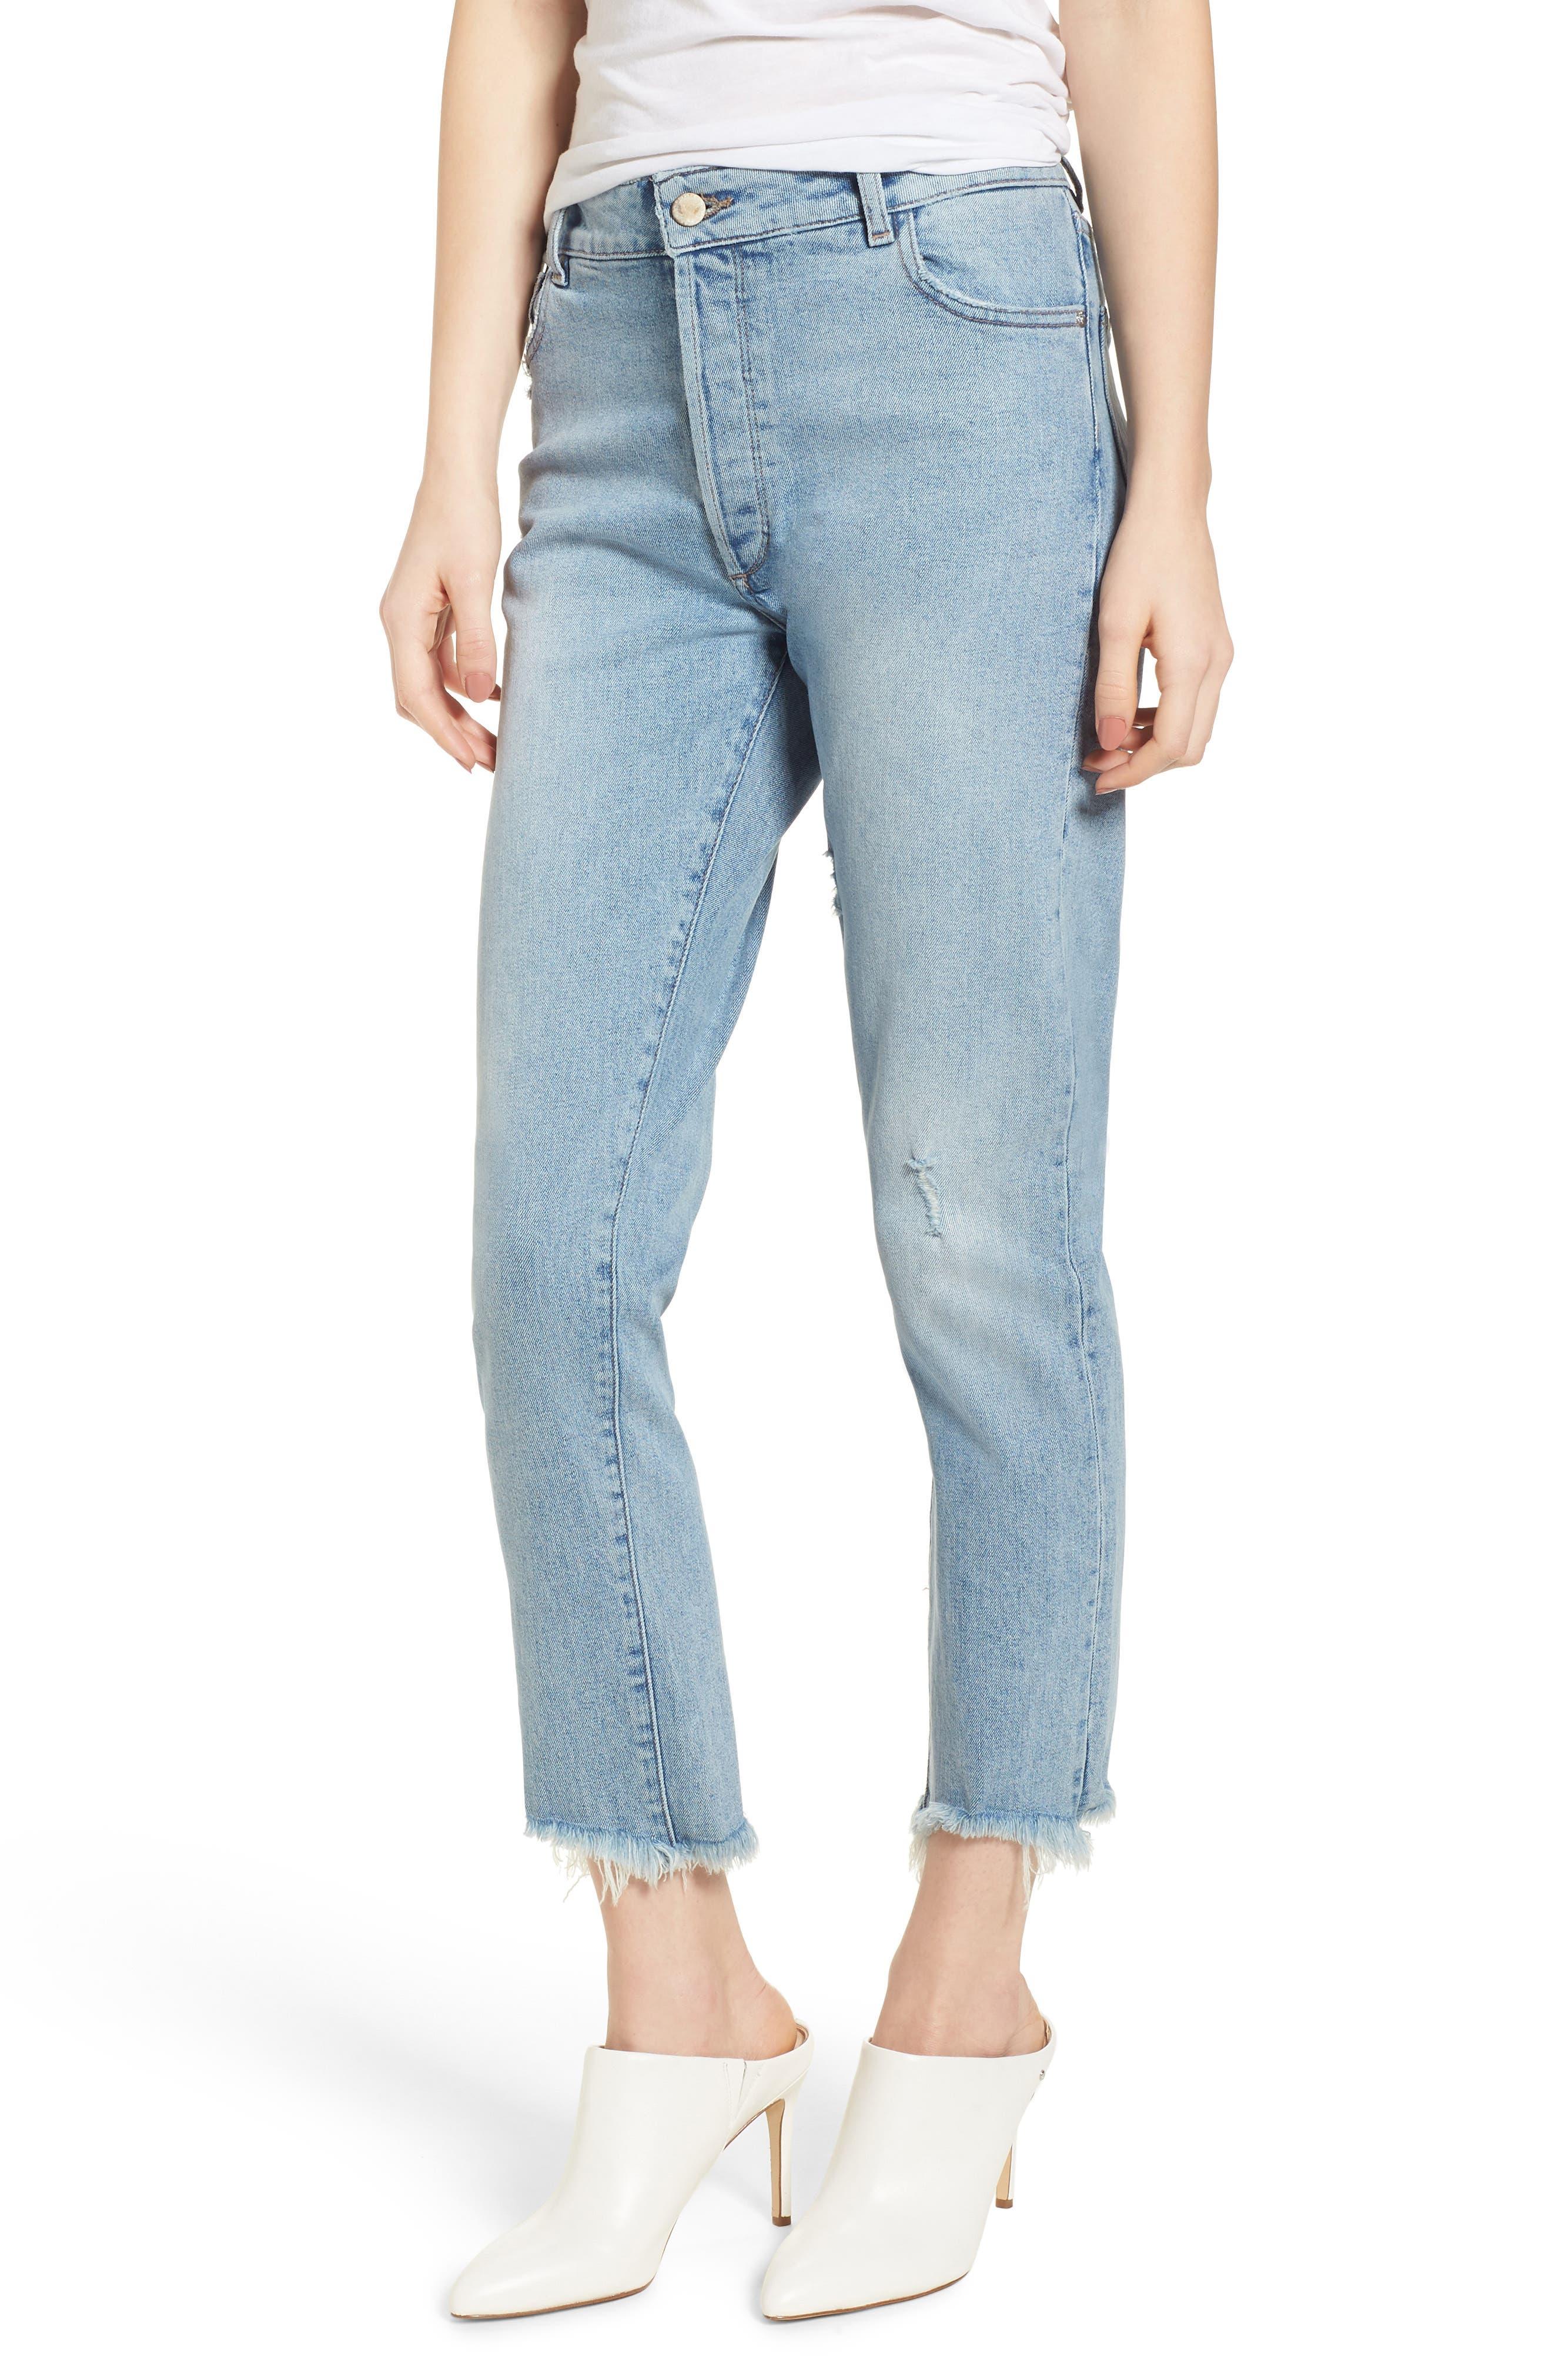 Bella Vintage Crop Slim Jeans,                         Main,                         color, Super Bleach